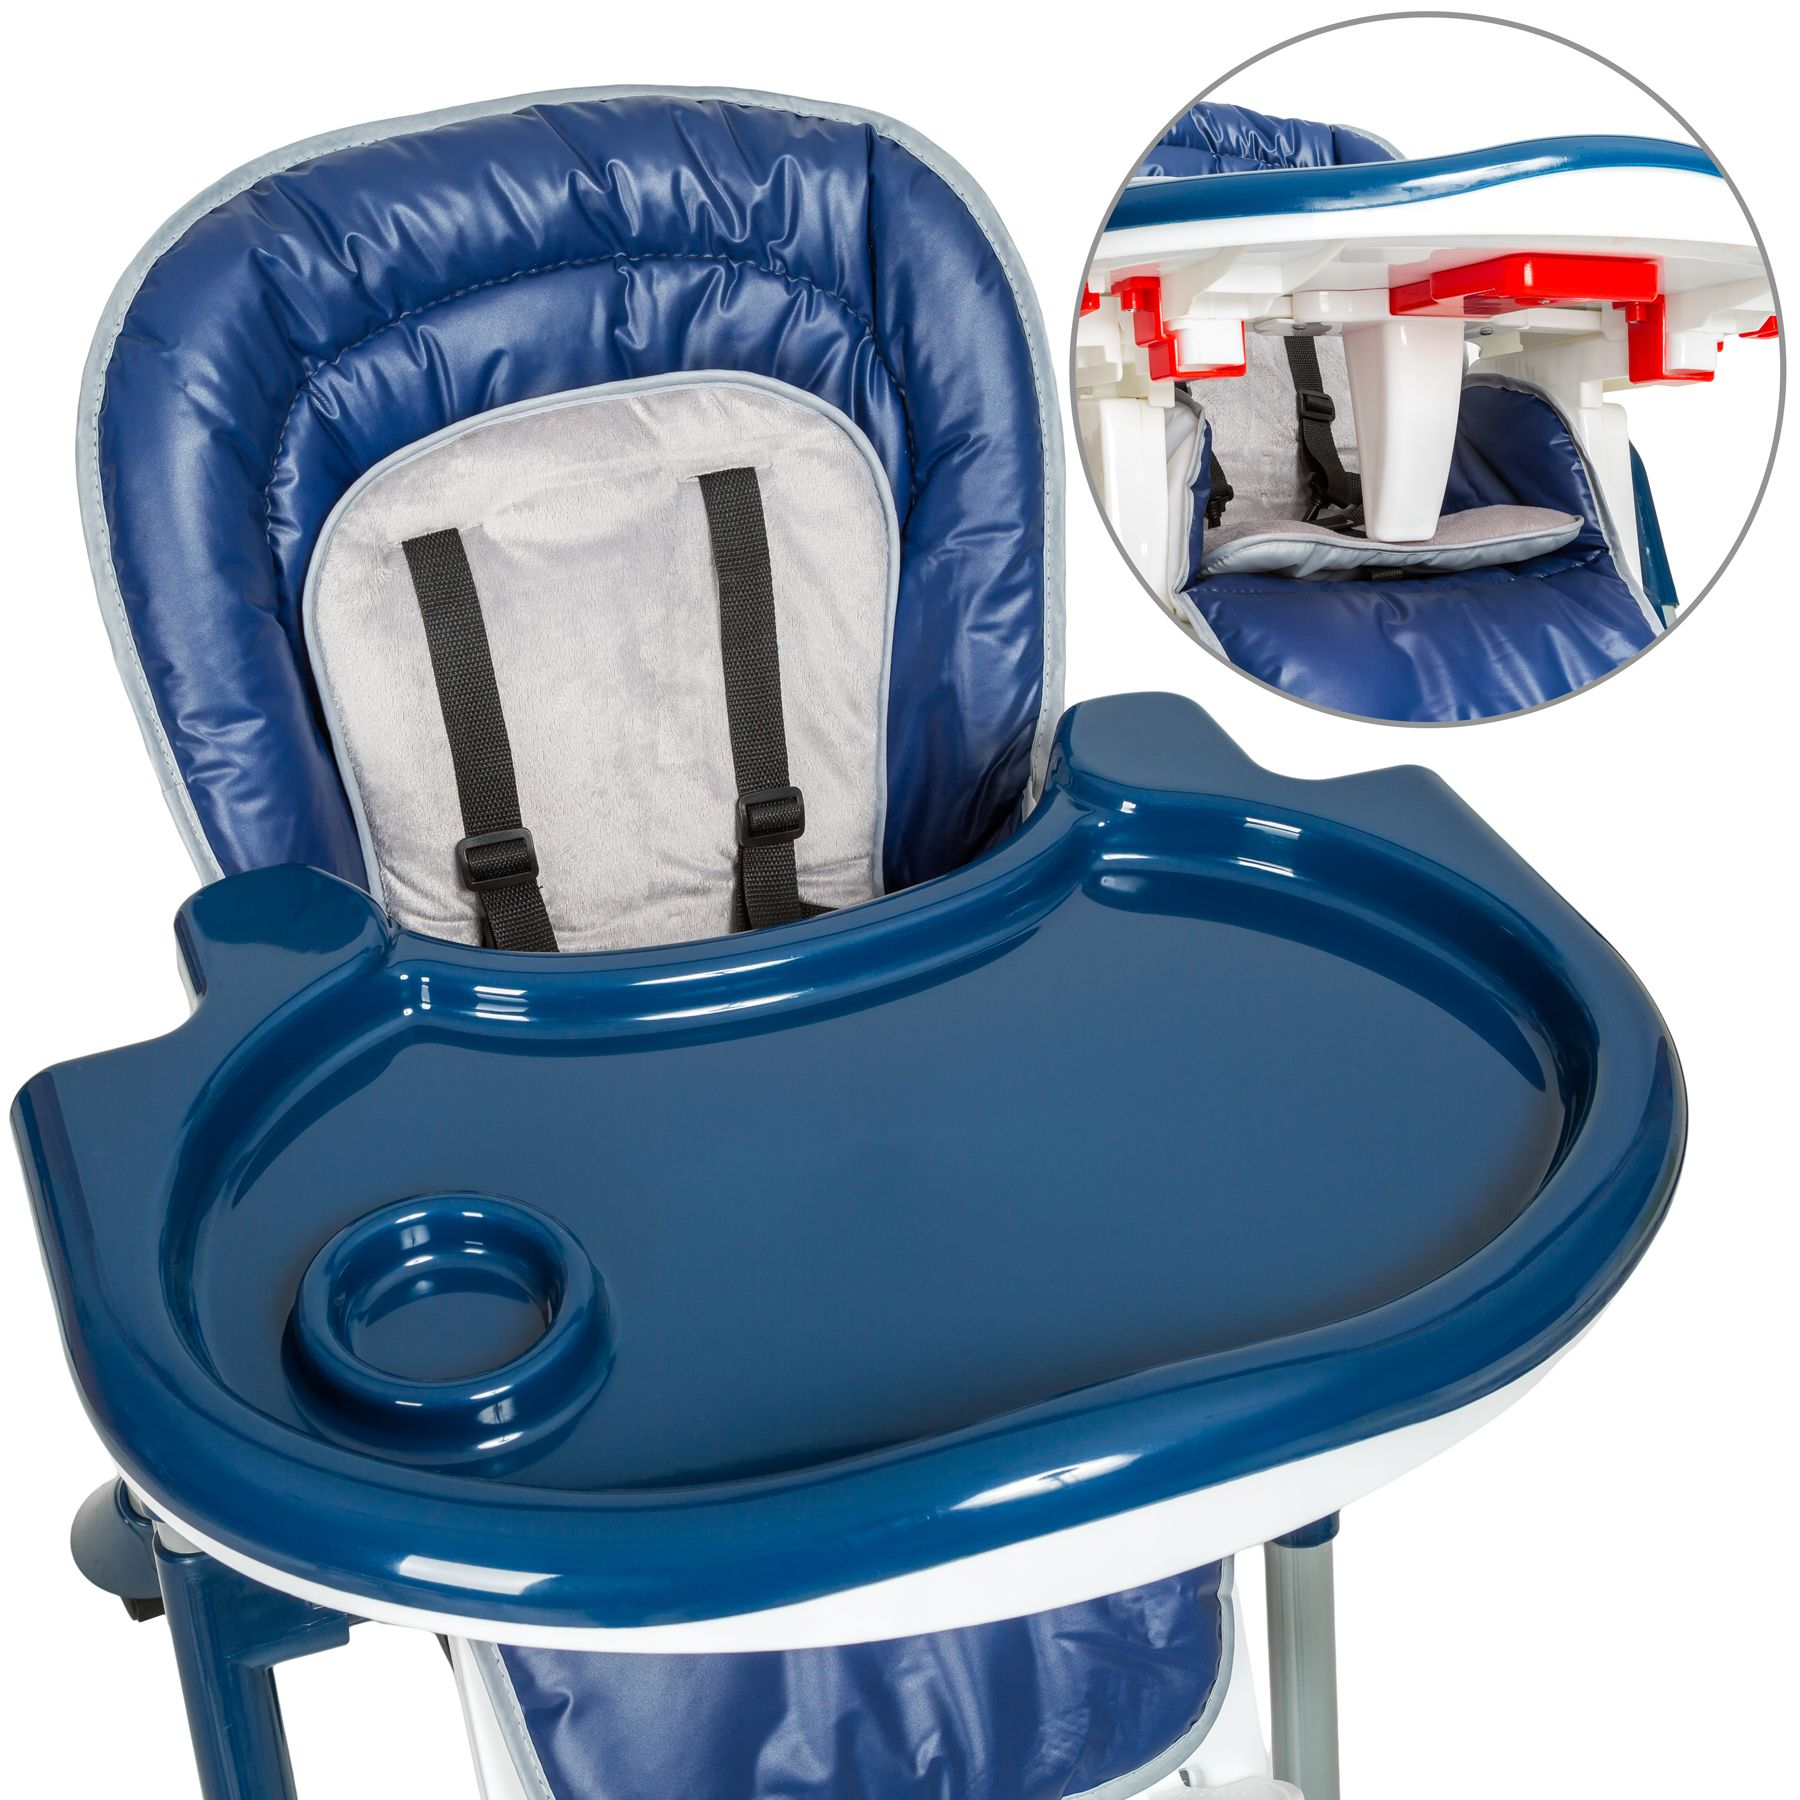 kinderhochstuhl treppenhochstuhl babyhochstuhl verstellbar babystuhl kinderstuhl 4260182872024. Black Bedroom Furniture Sets. Home Design Ideas